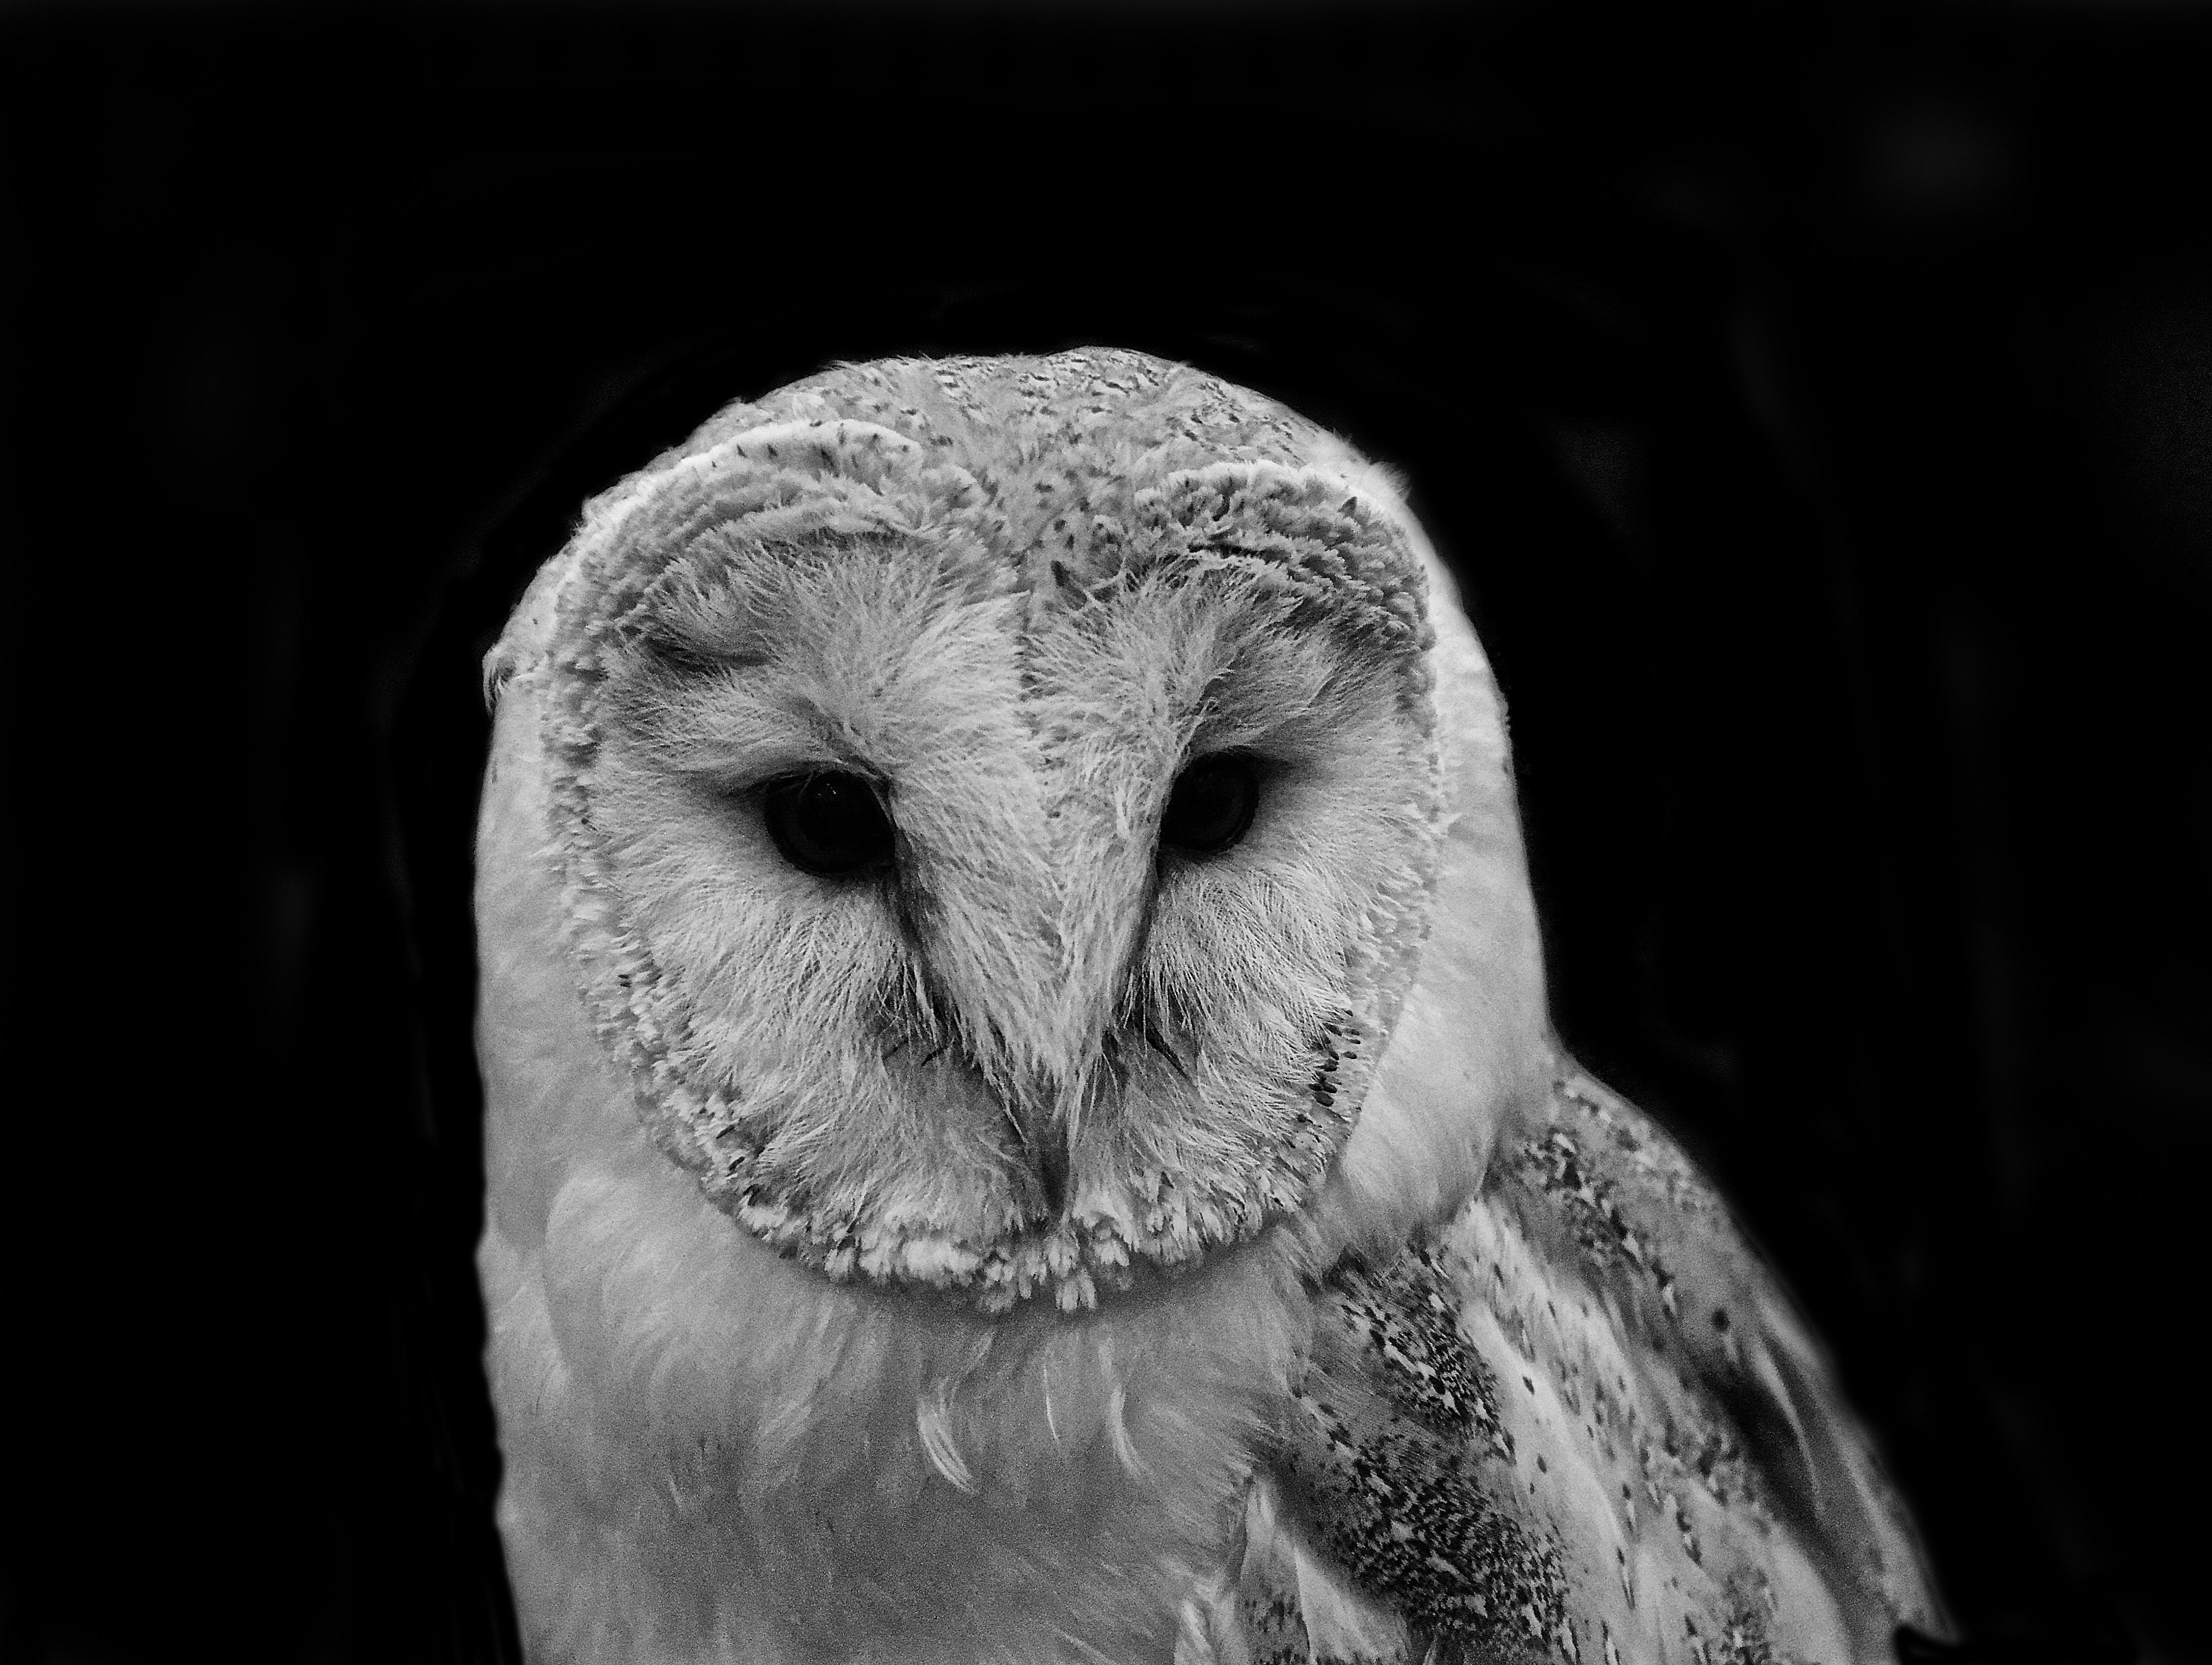 Nature bird wing black and white white photography barn animal wildlife beak black monochrome owl fauna